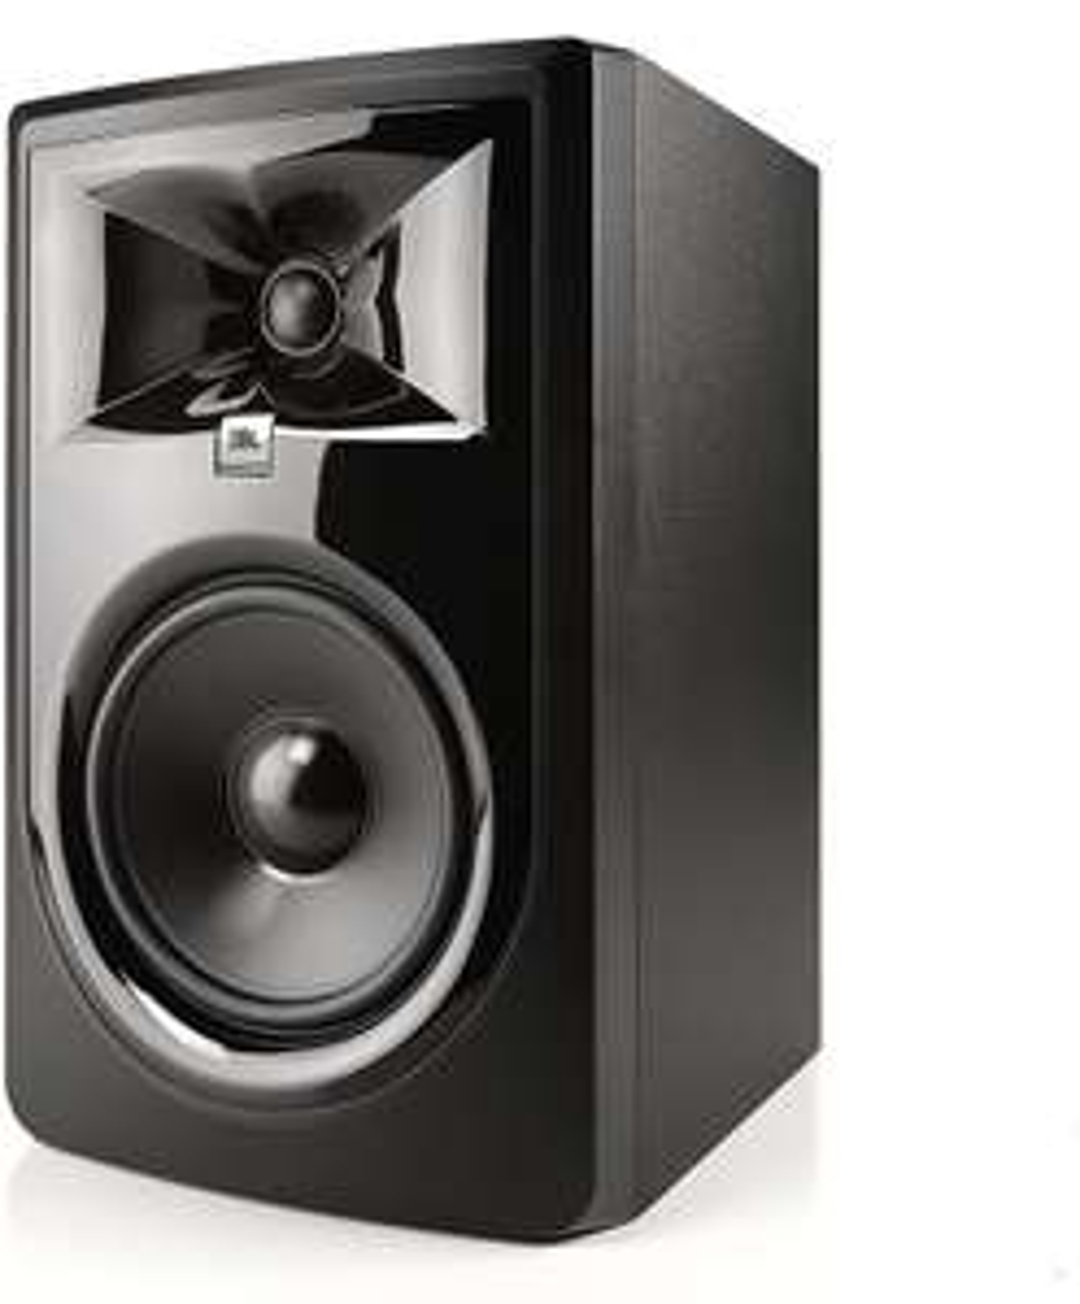 "JBL Professional 306P MKII 6"" 2 Way Powered Studio Reference Monitor - £90.86 @ Amazon"